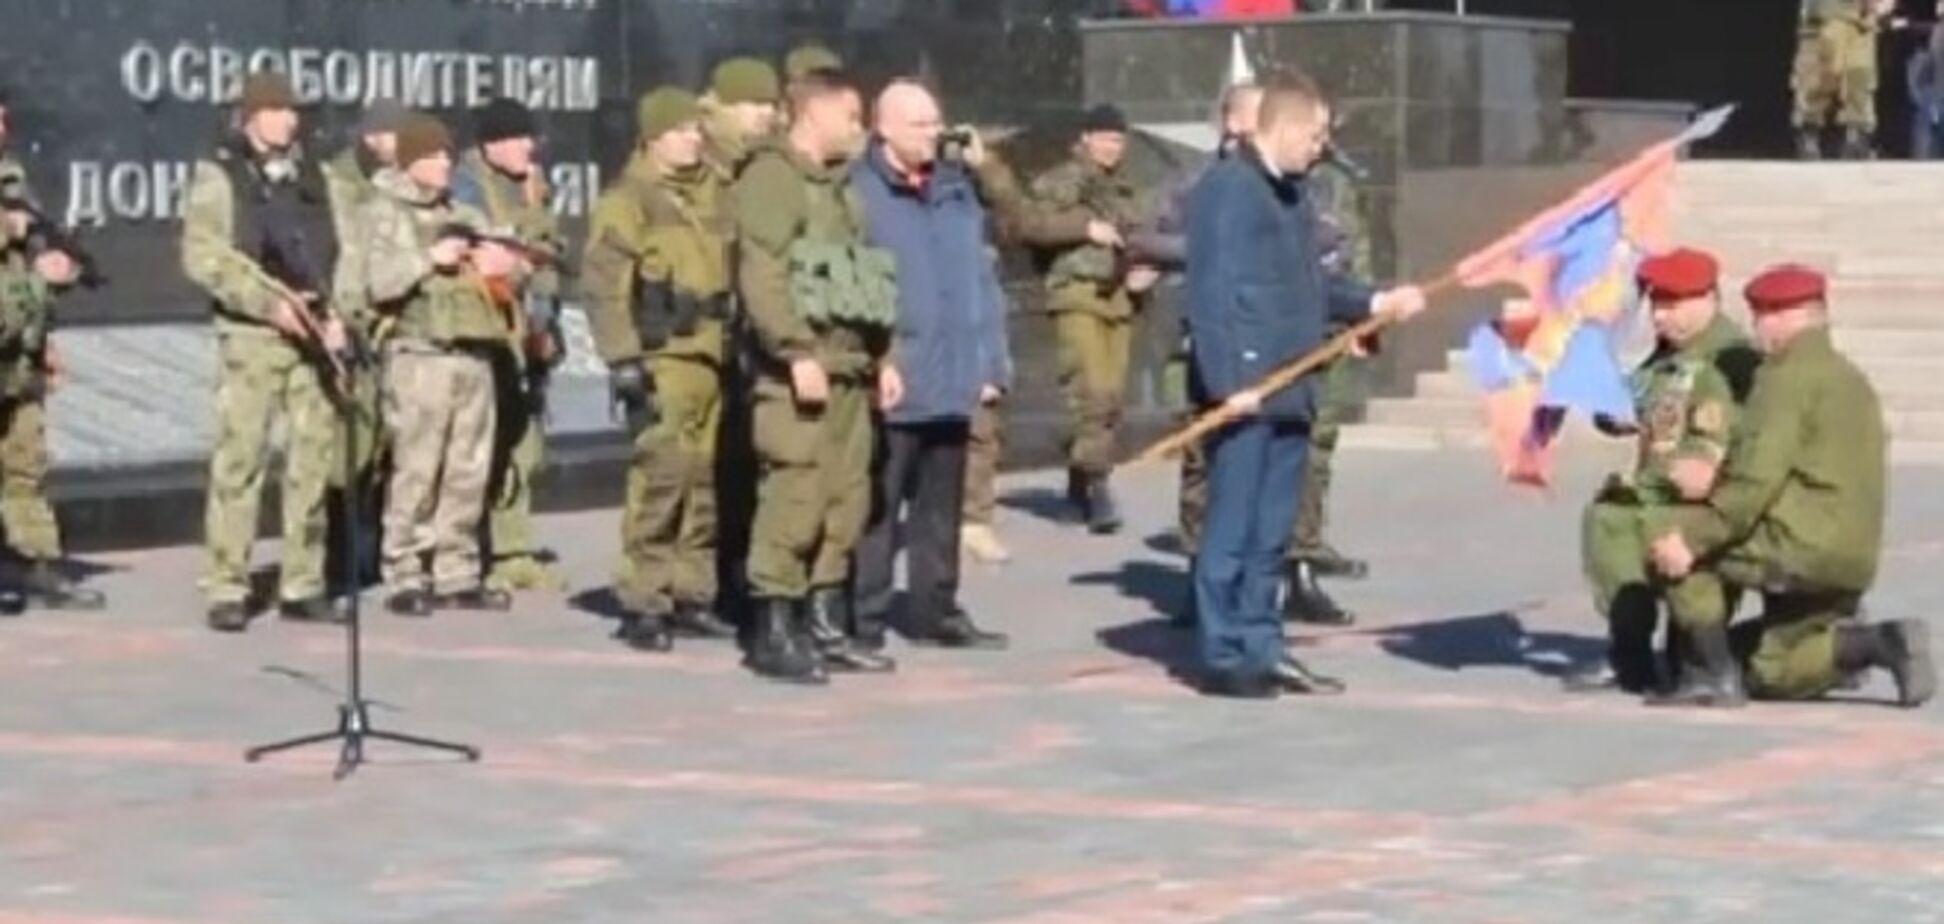 В Донецке боевики 'ДНР' провели парад